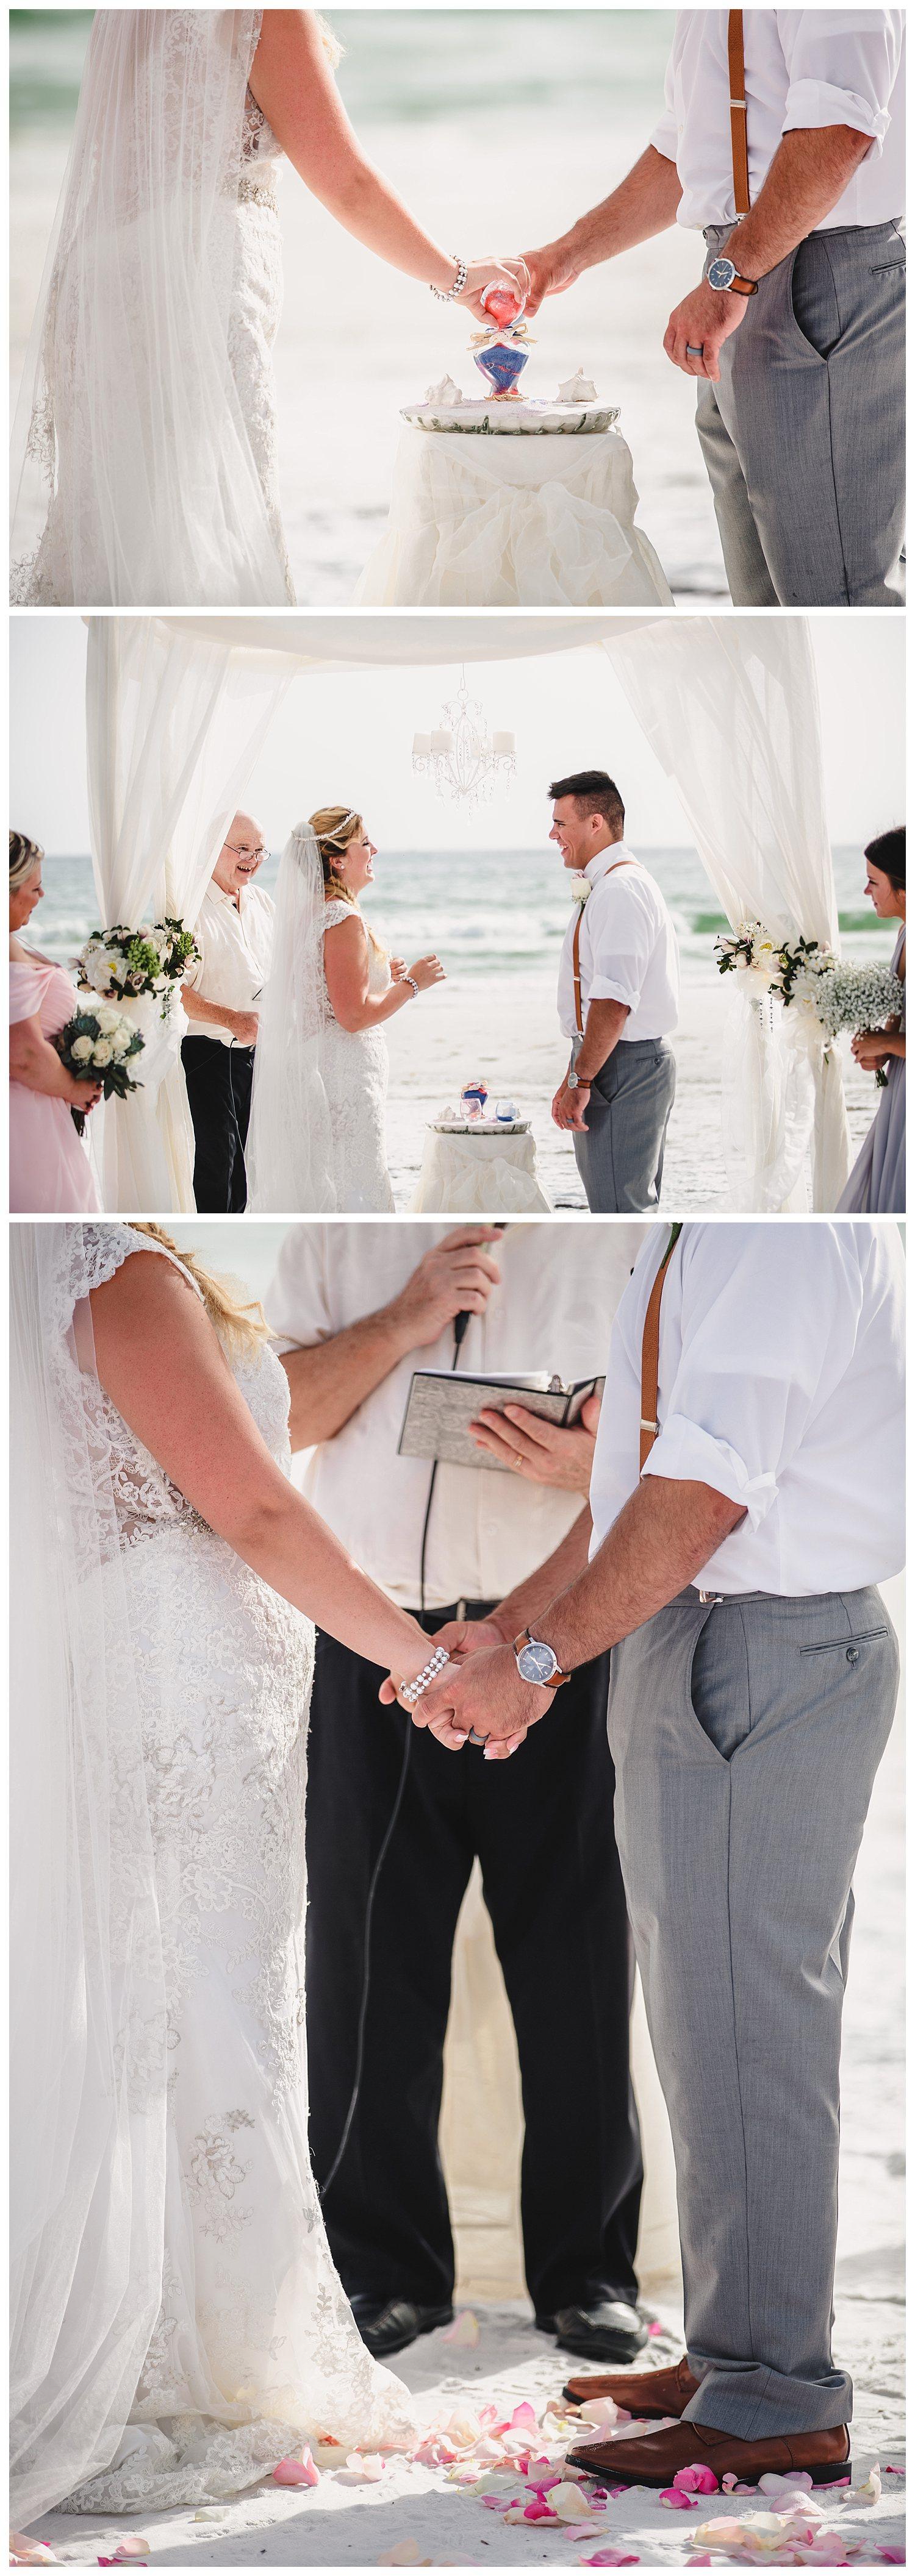 Kelsey_Diane_Photography_Destination_Wedding_Sarasota_Florida_Beach_Wedding_Alex_Austin_0651.jpg